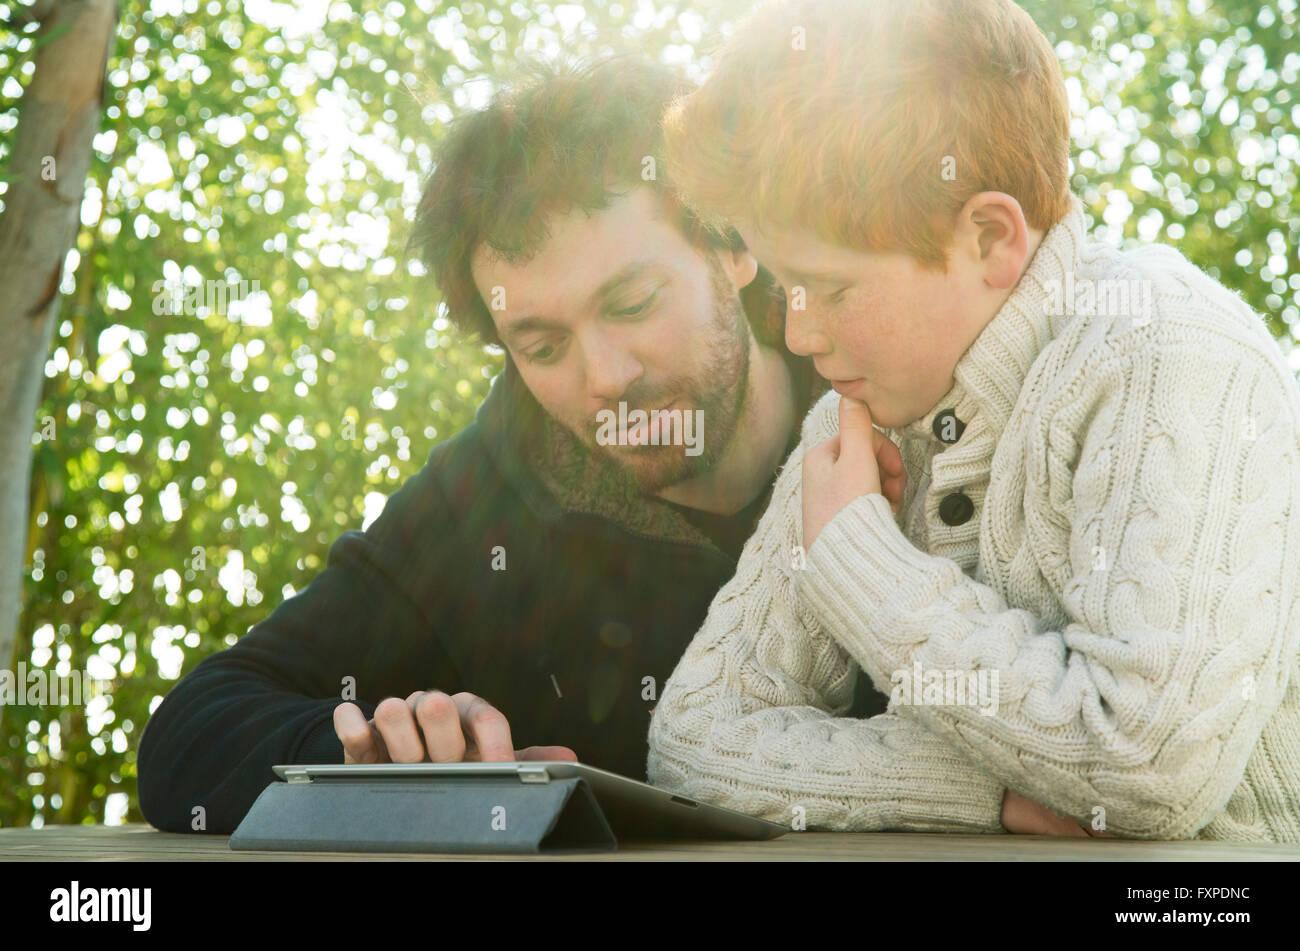 Padre e hijo mirando juntos tableta digital Imagen De Stock